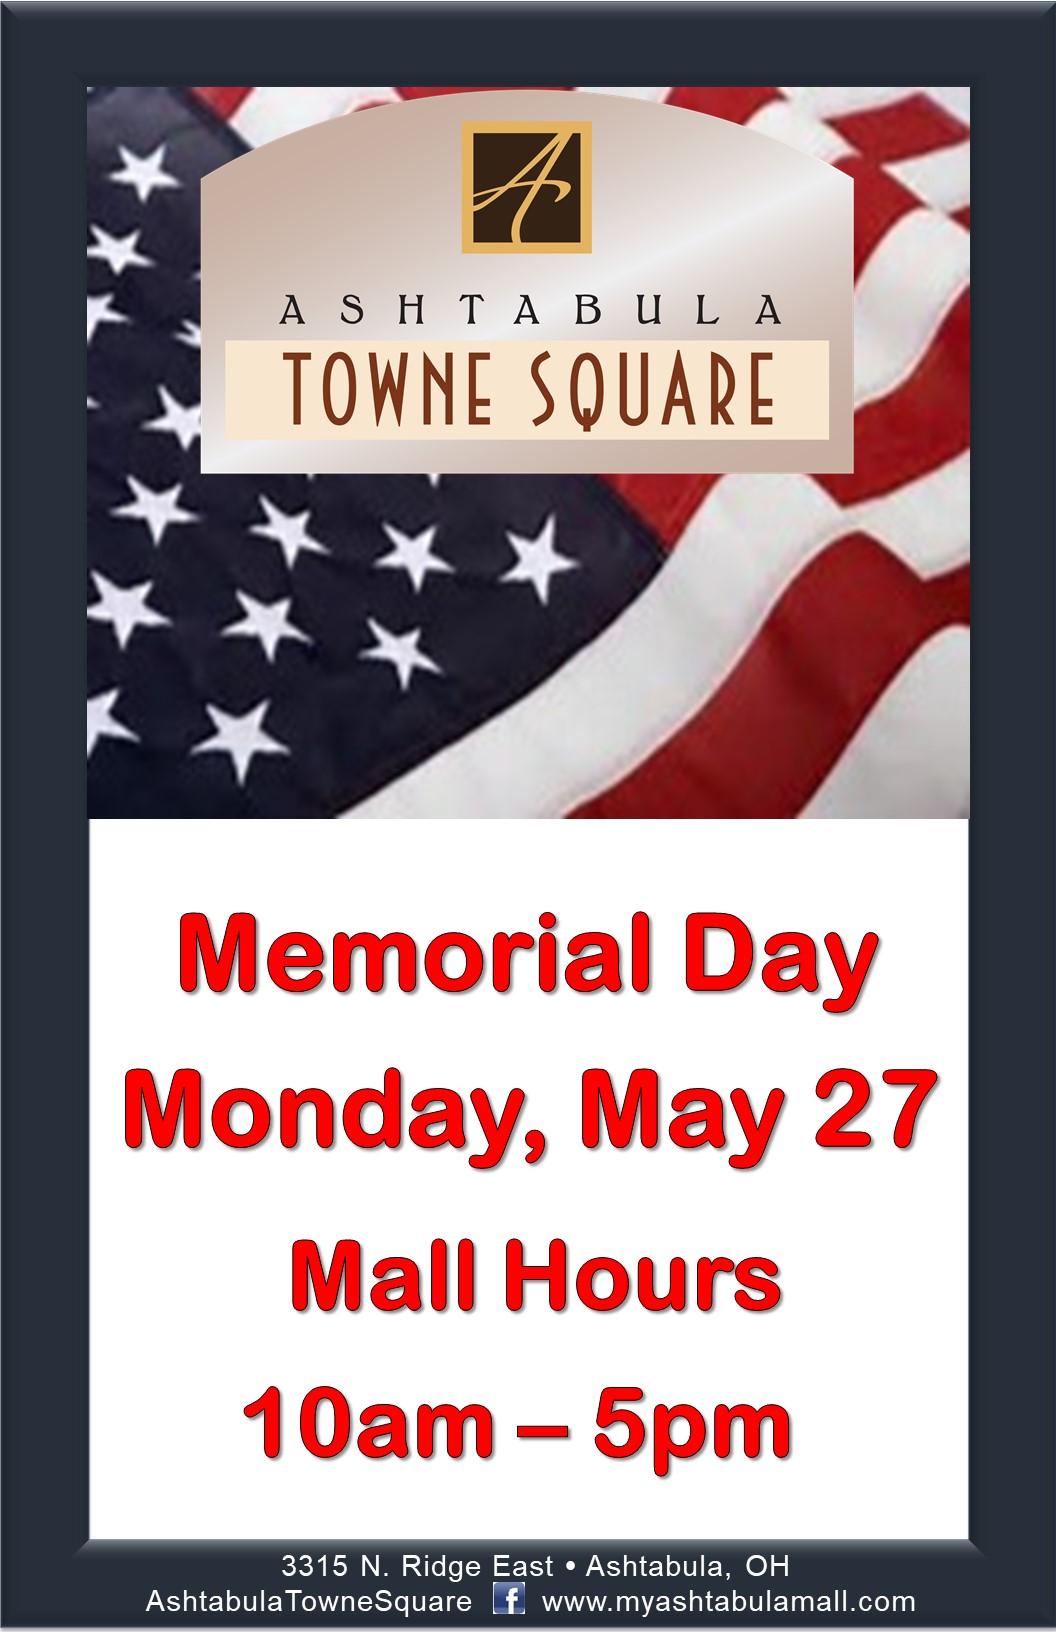 Memorial Day hours poster.jpg